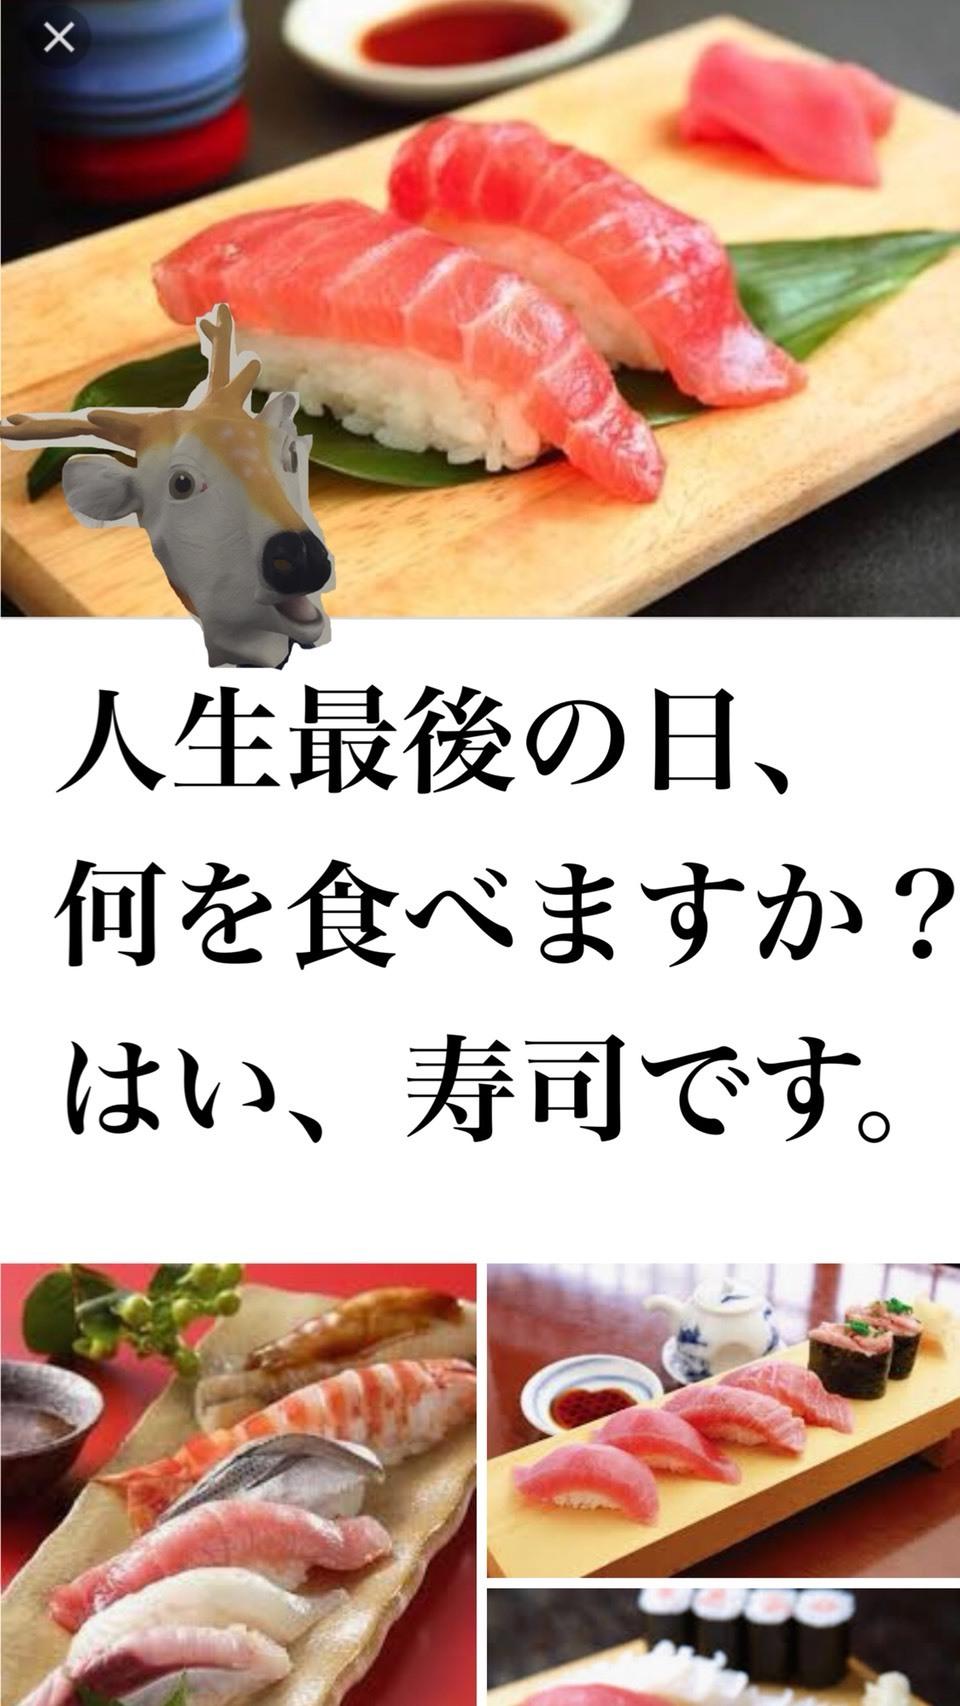 S__31981576.jpg